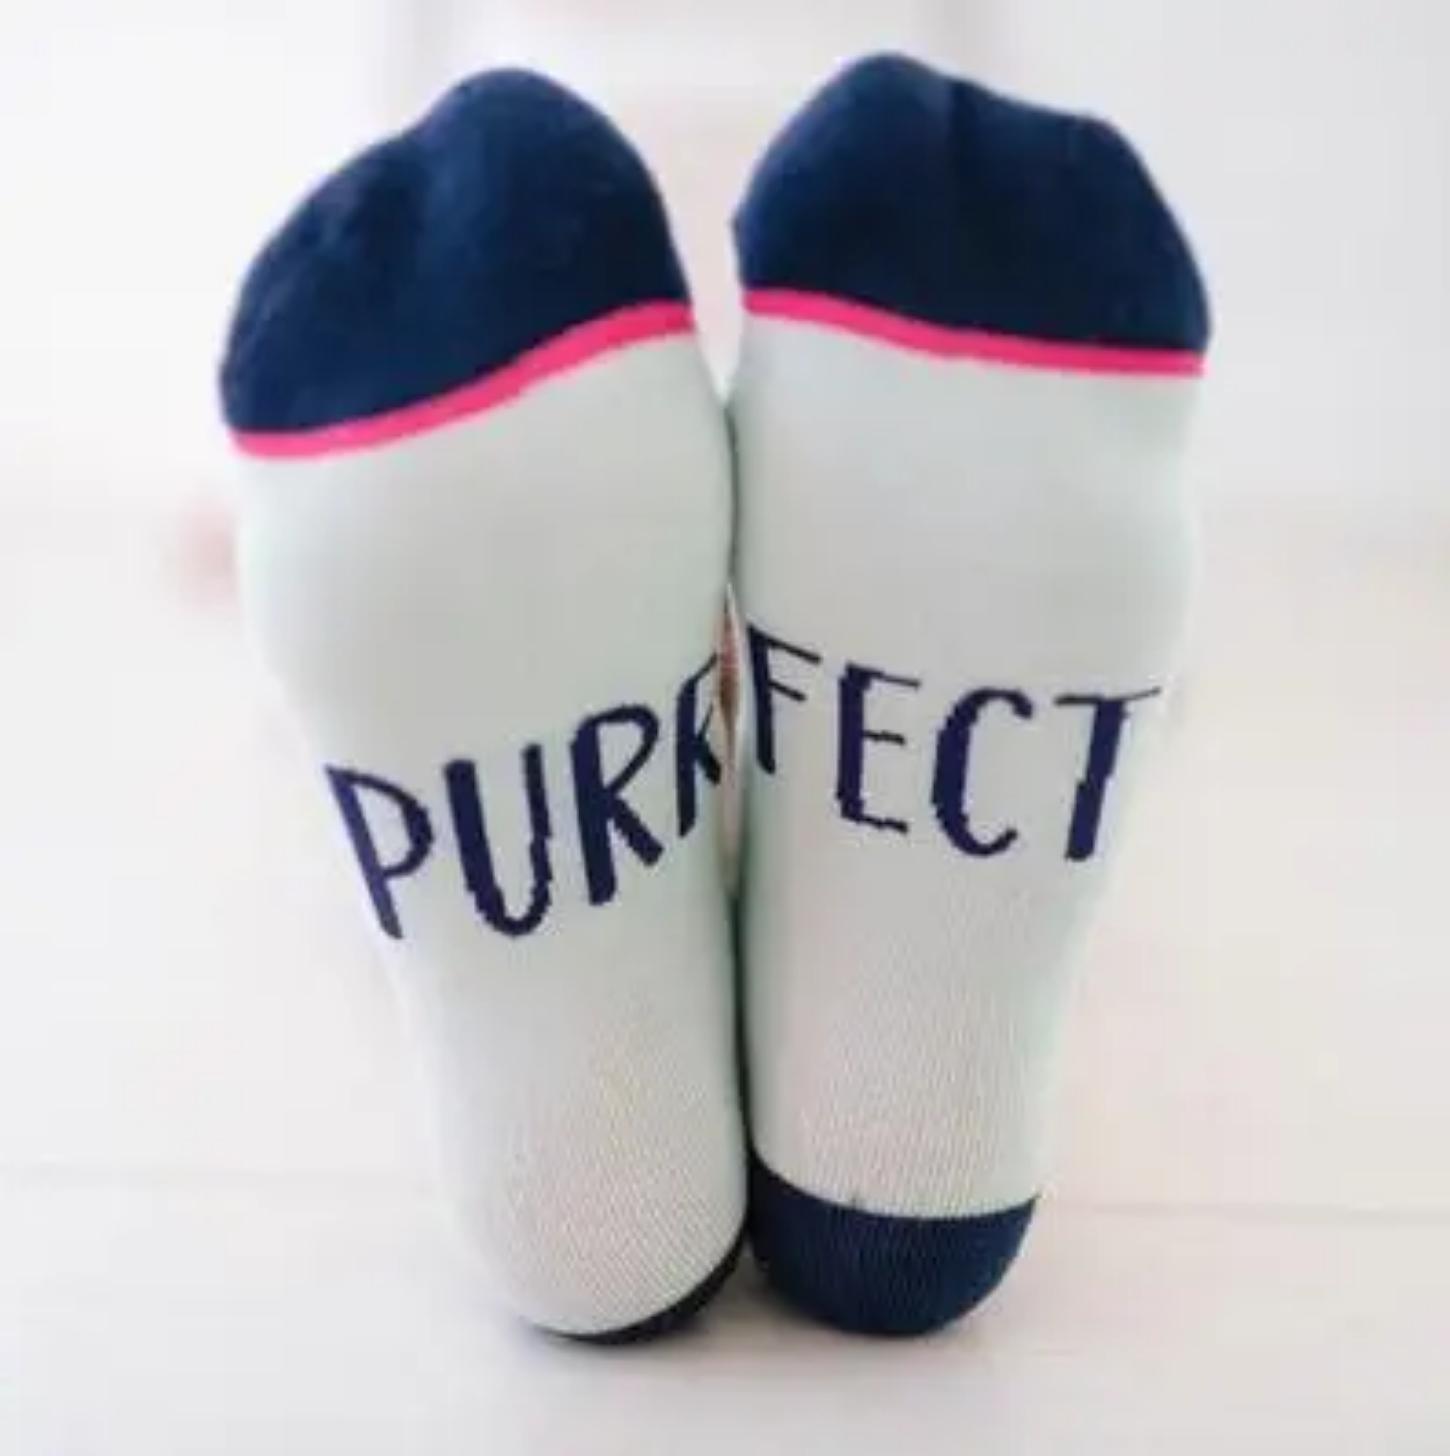 Woven Pear Purr Fect Sock